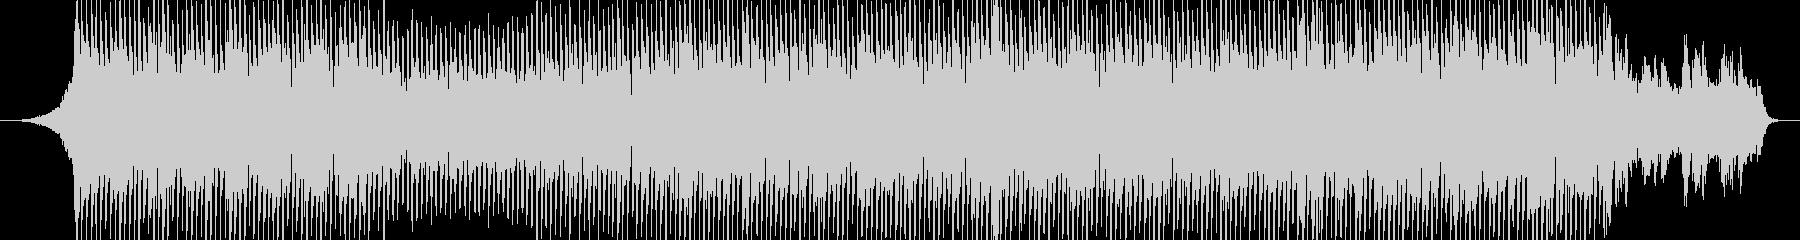 EDMダンス、ピアノメロ、クラブ系-12の未再生の波形